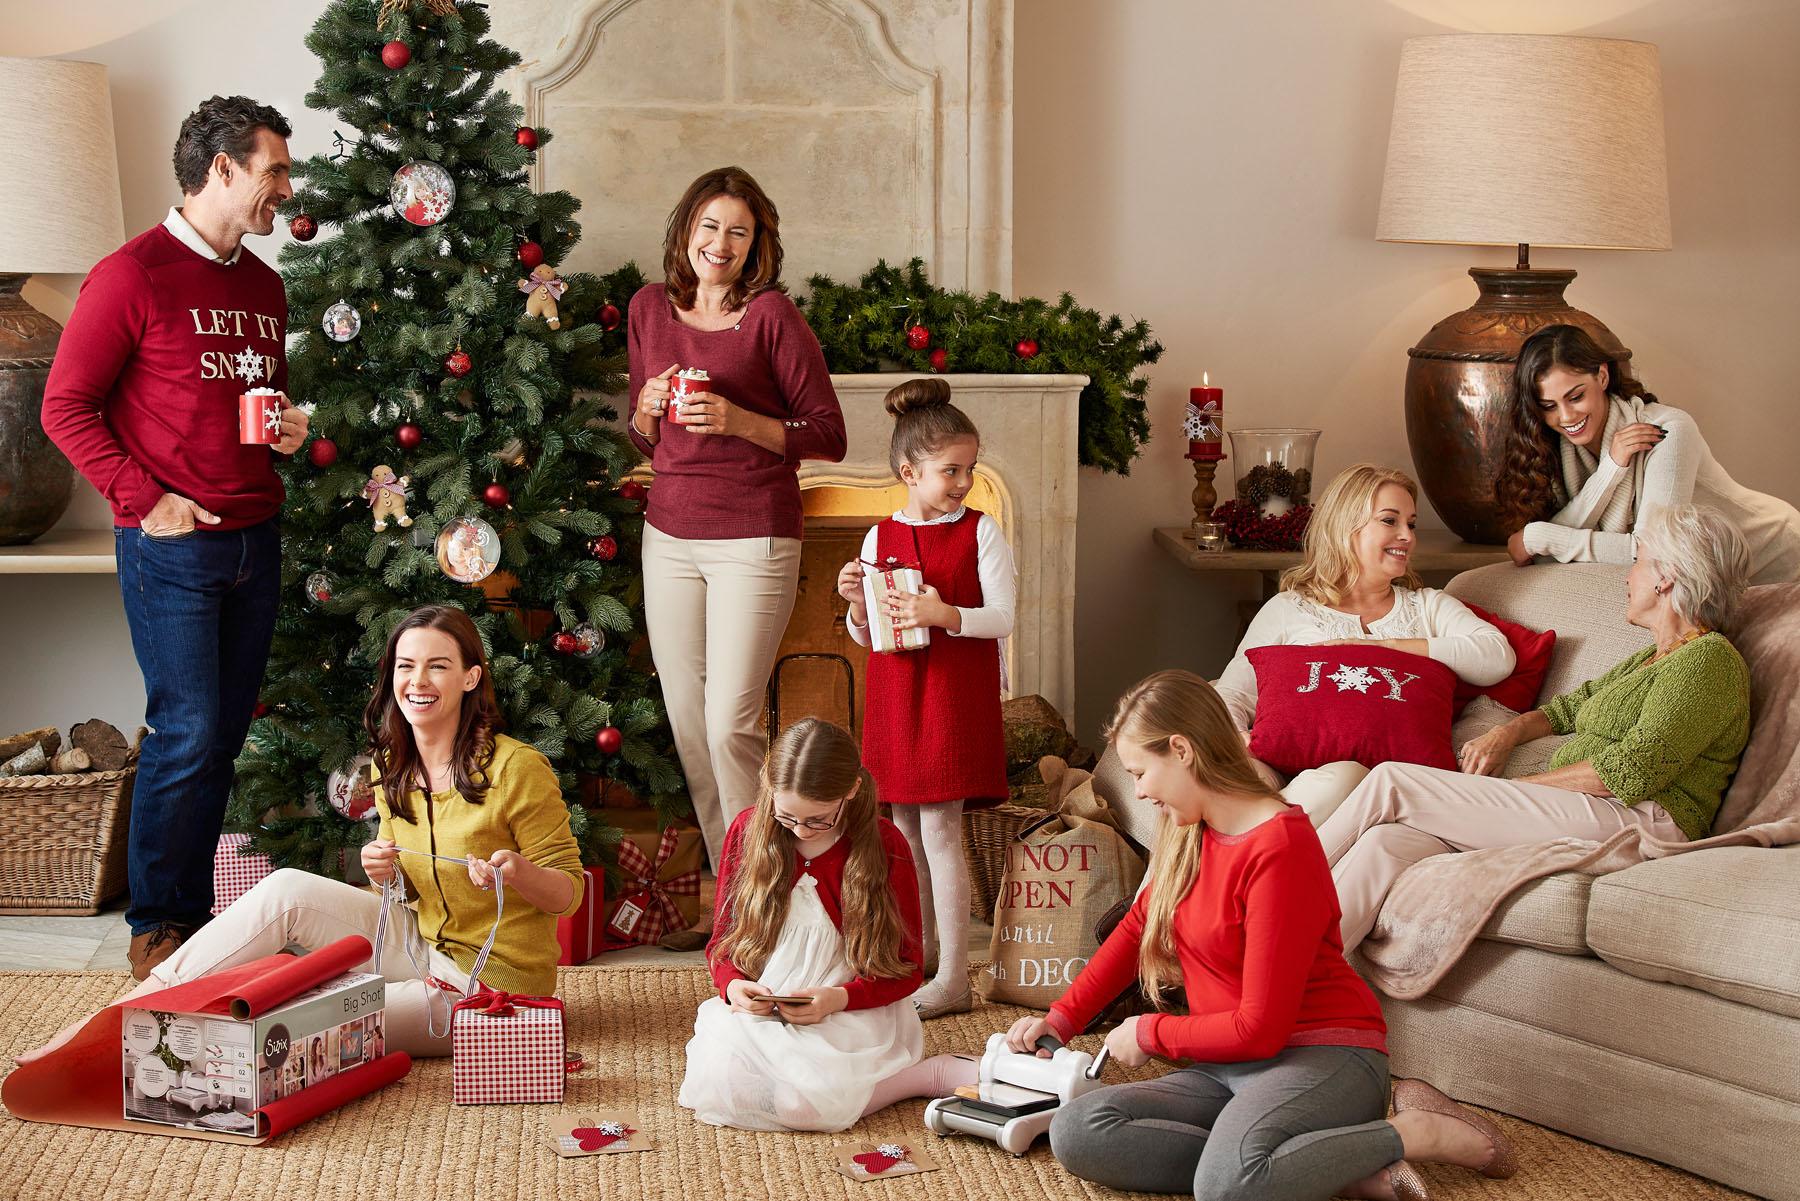 Big family Christmas scene